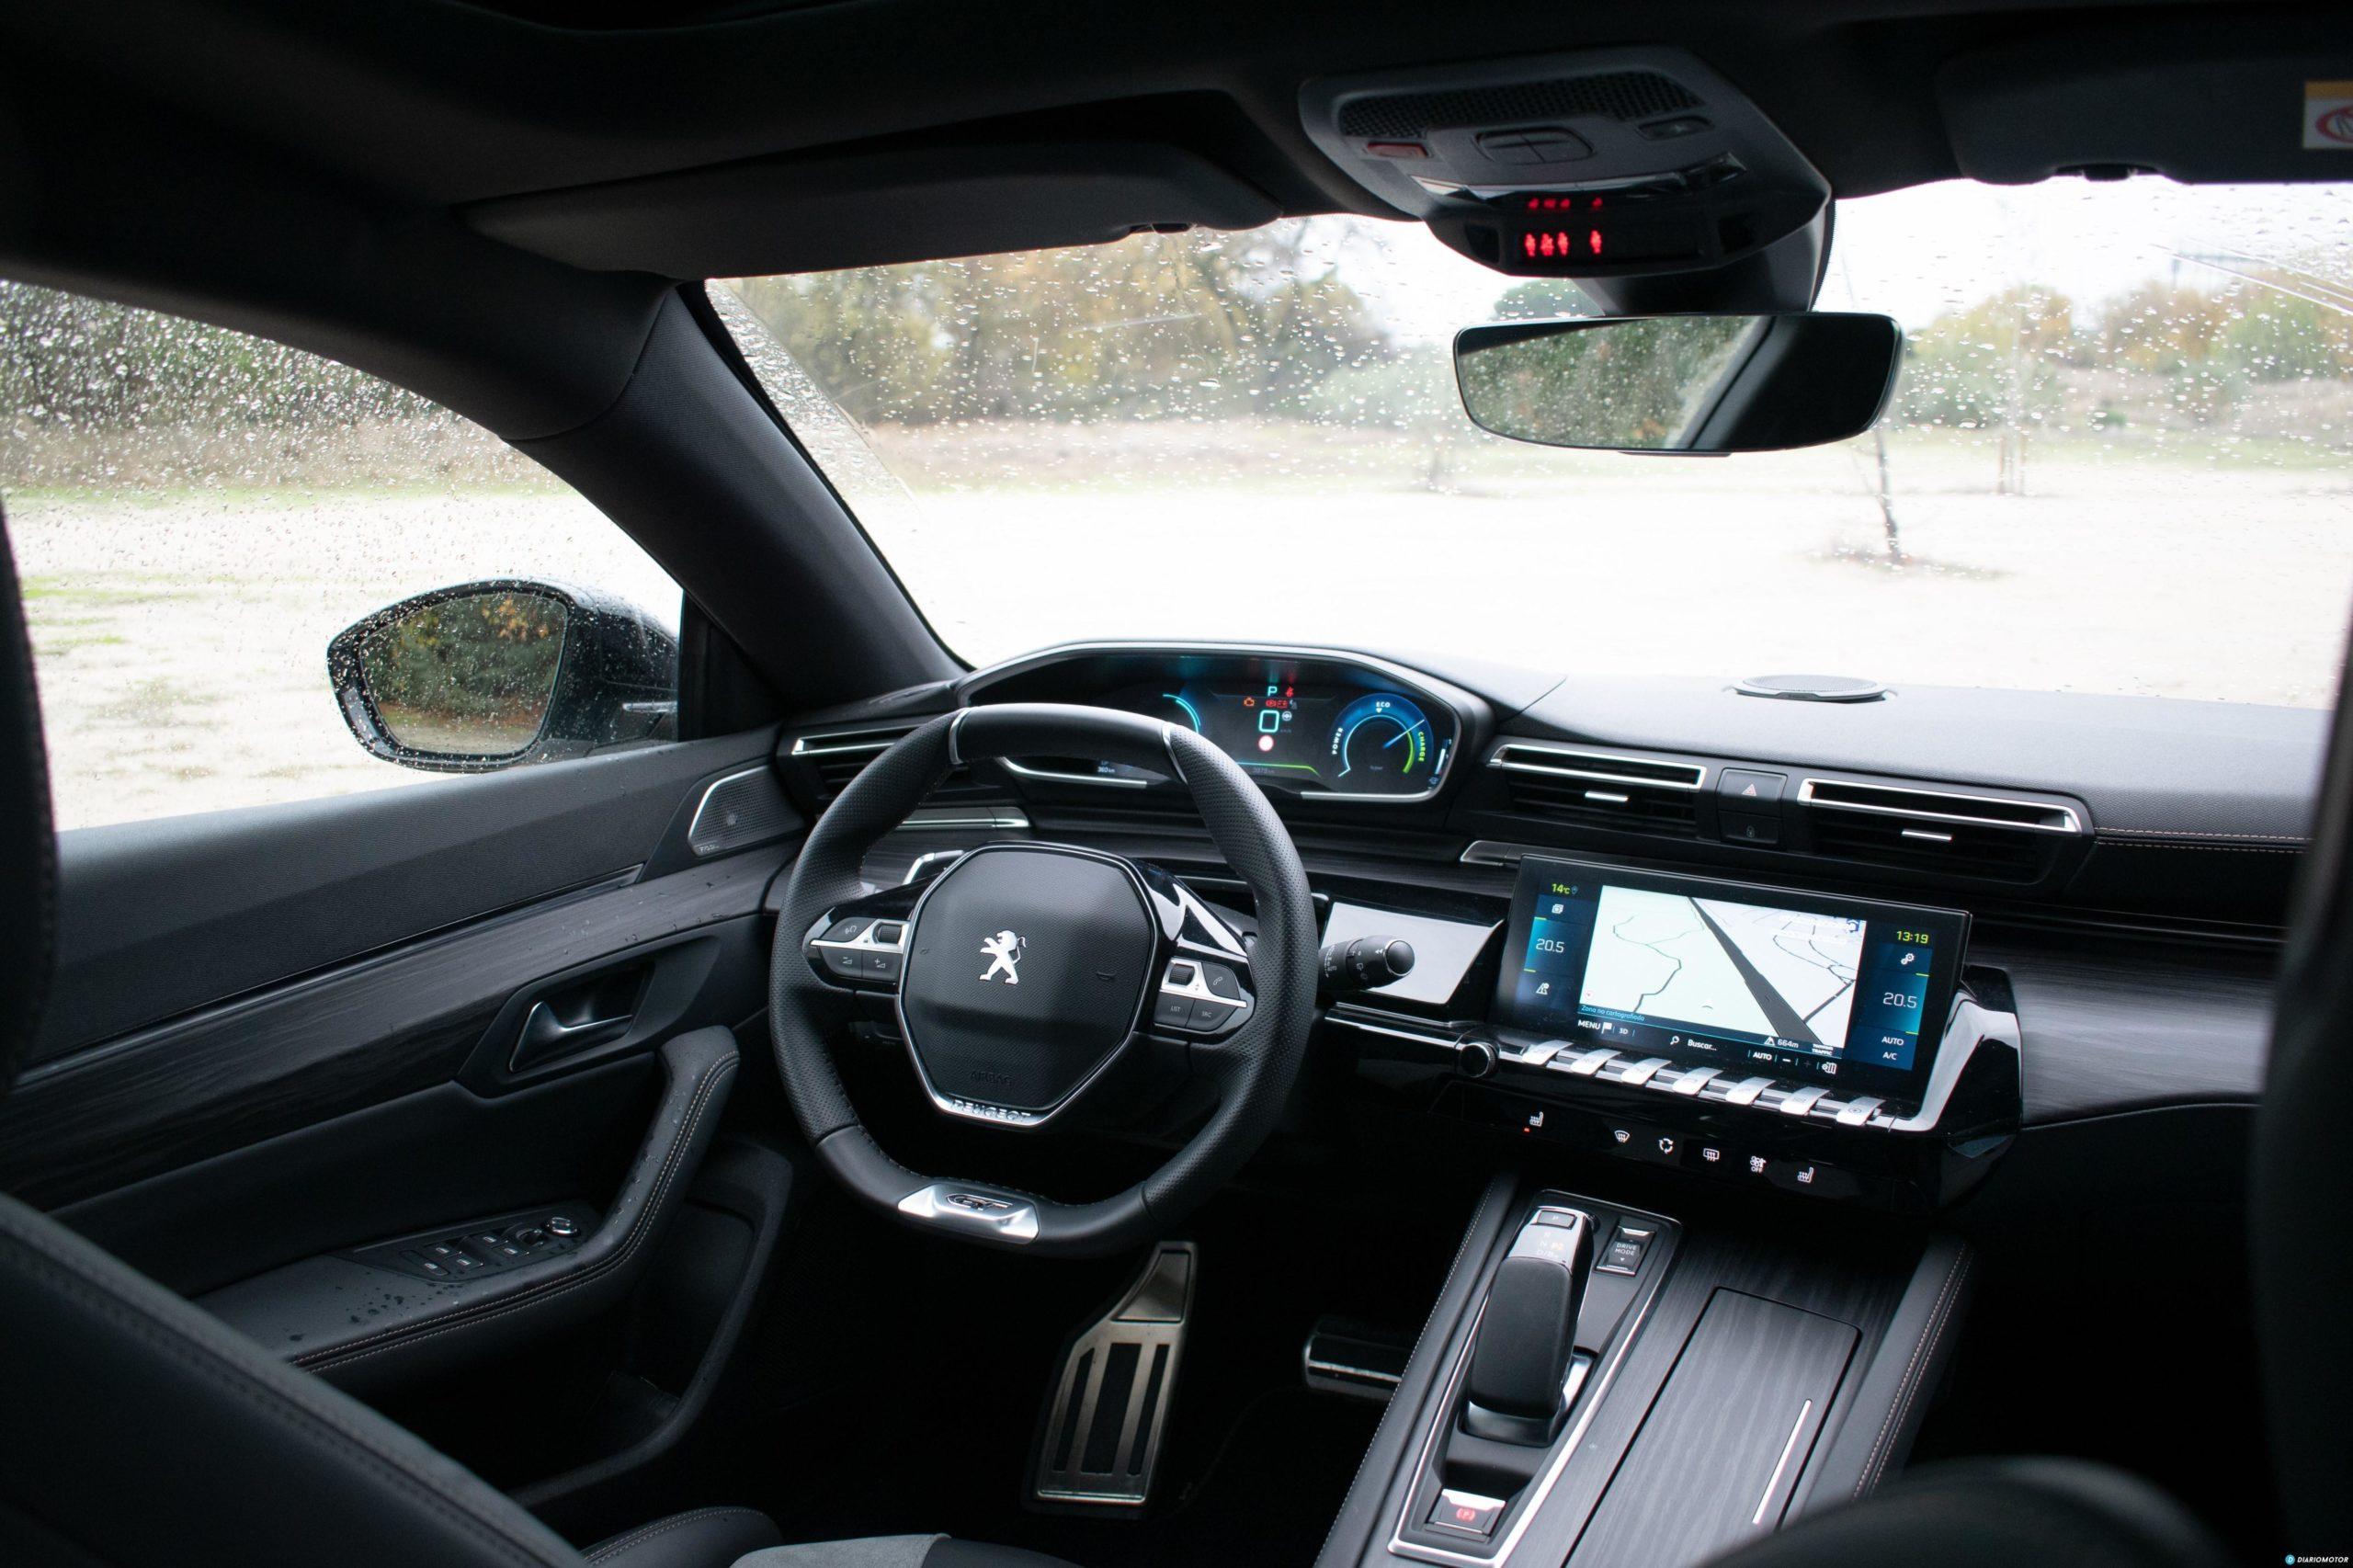 Prueba Contacto Peugeot 508sw Hybrid 15